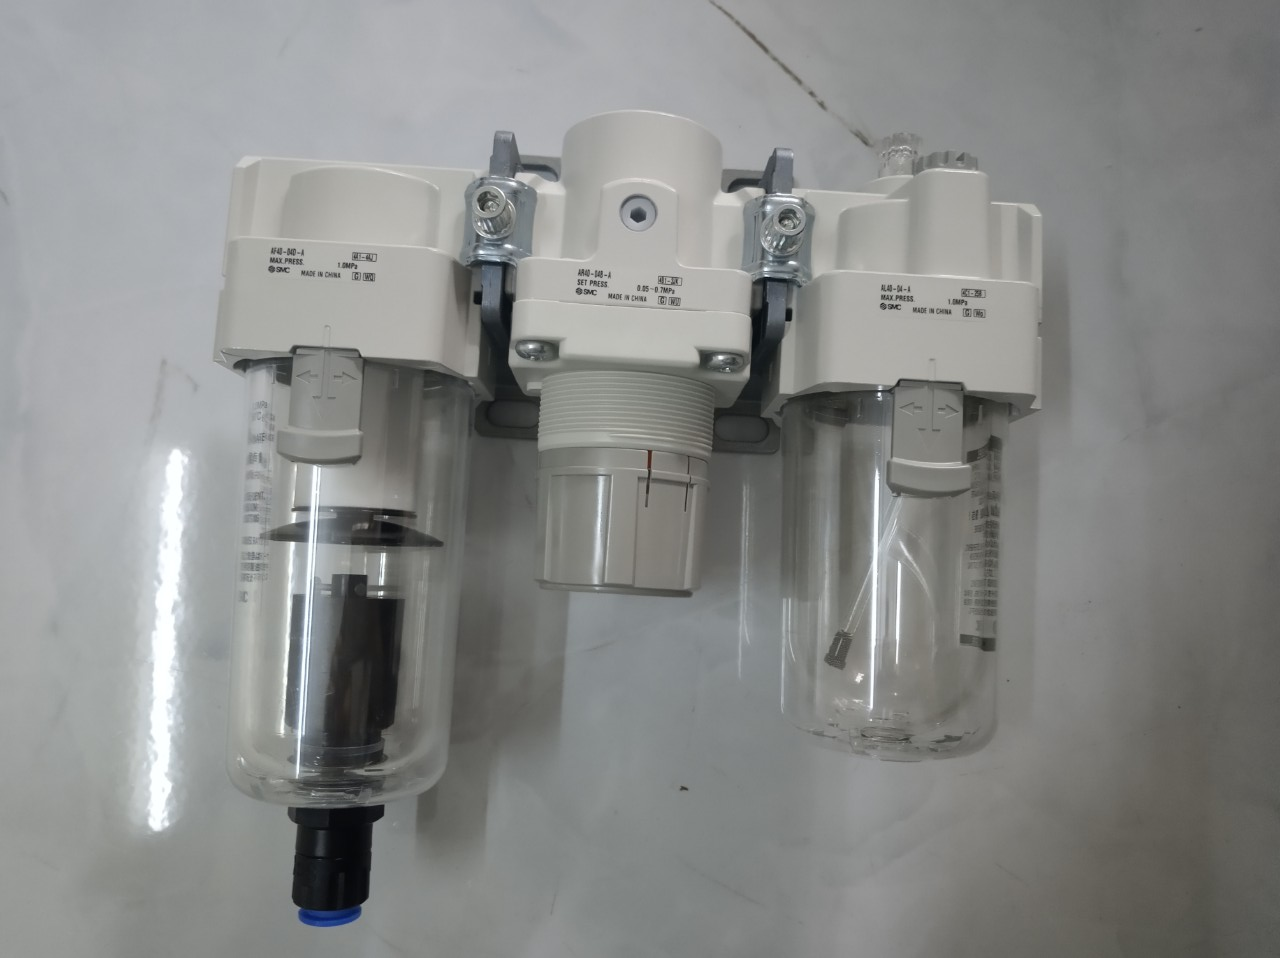 Bộ lọc khí SMC AC40-04DG-A